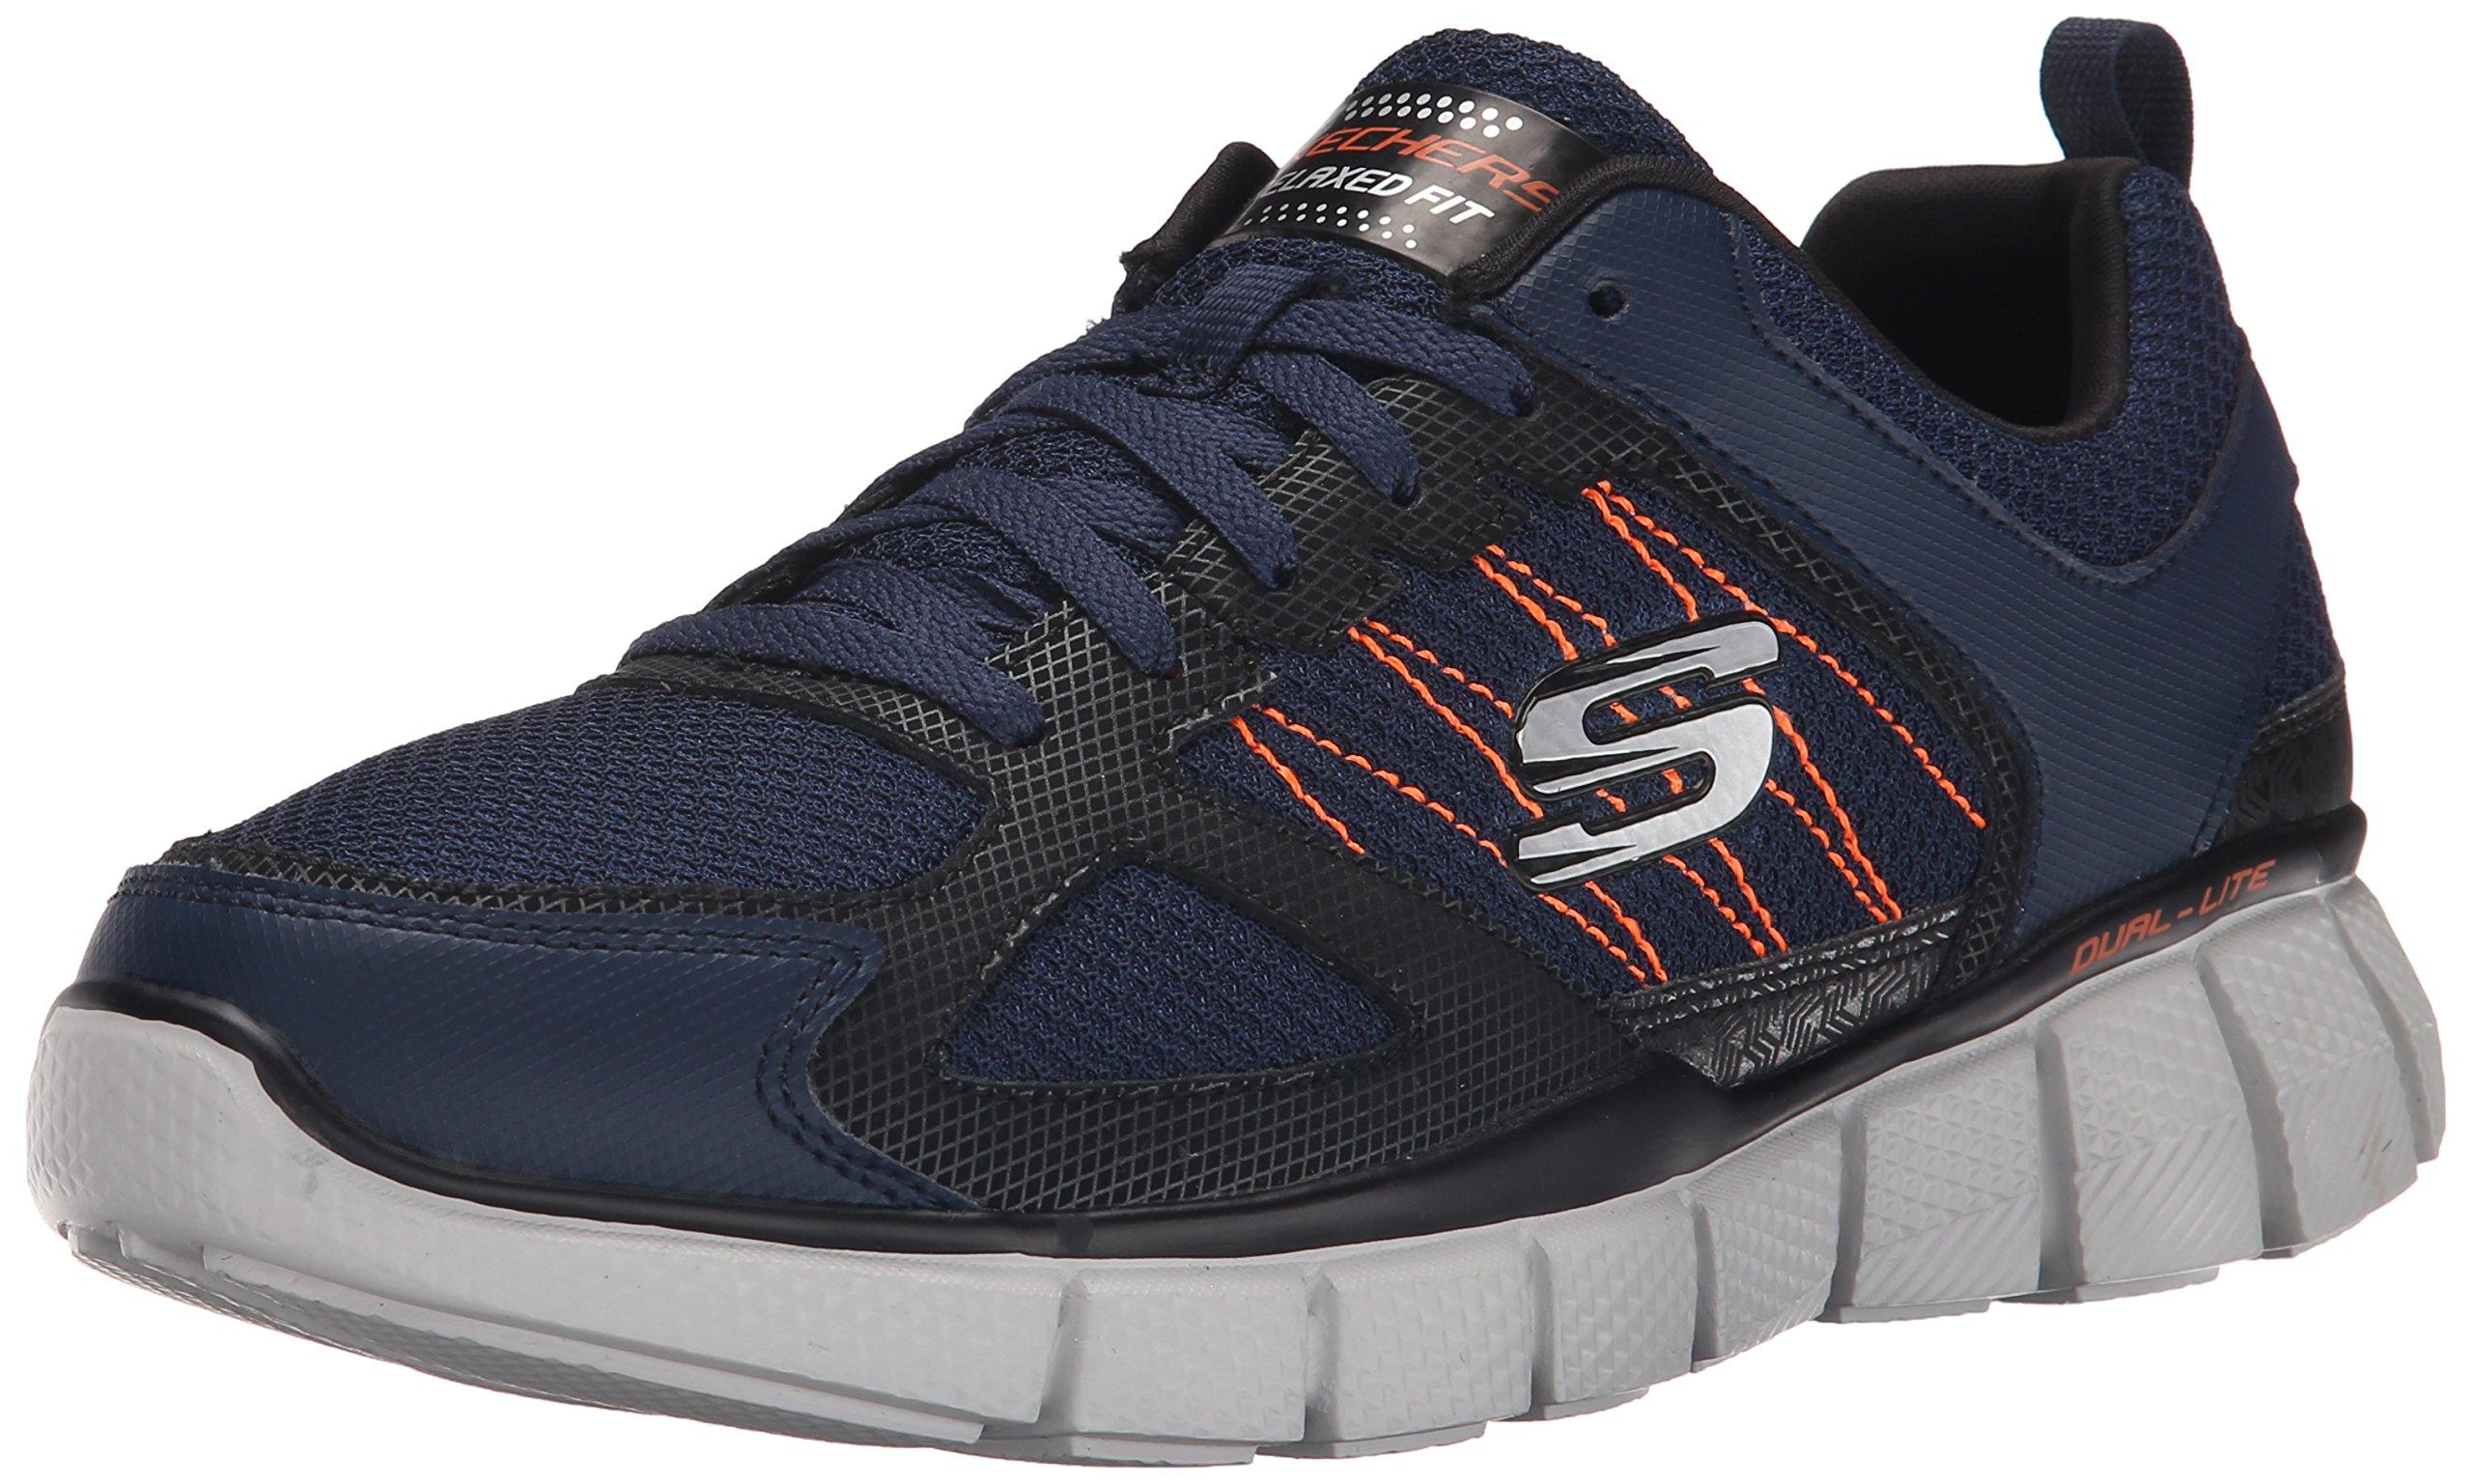 Skechers Sport Men's Equalizer 2.0 True Balance Sneaker,Navy/Orange,7 M US